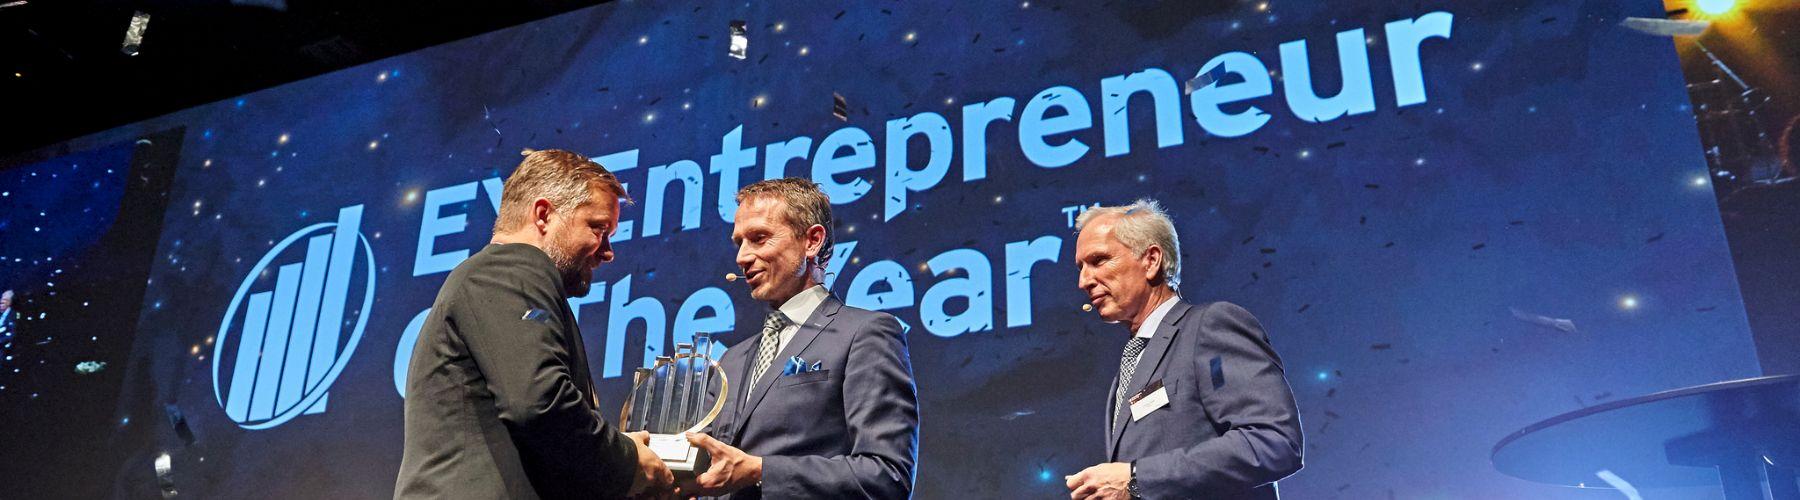 EY Entrepreneur of the Year Denmark cover image